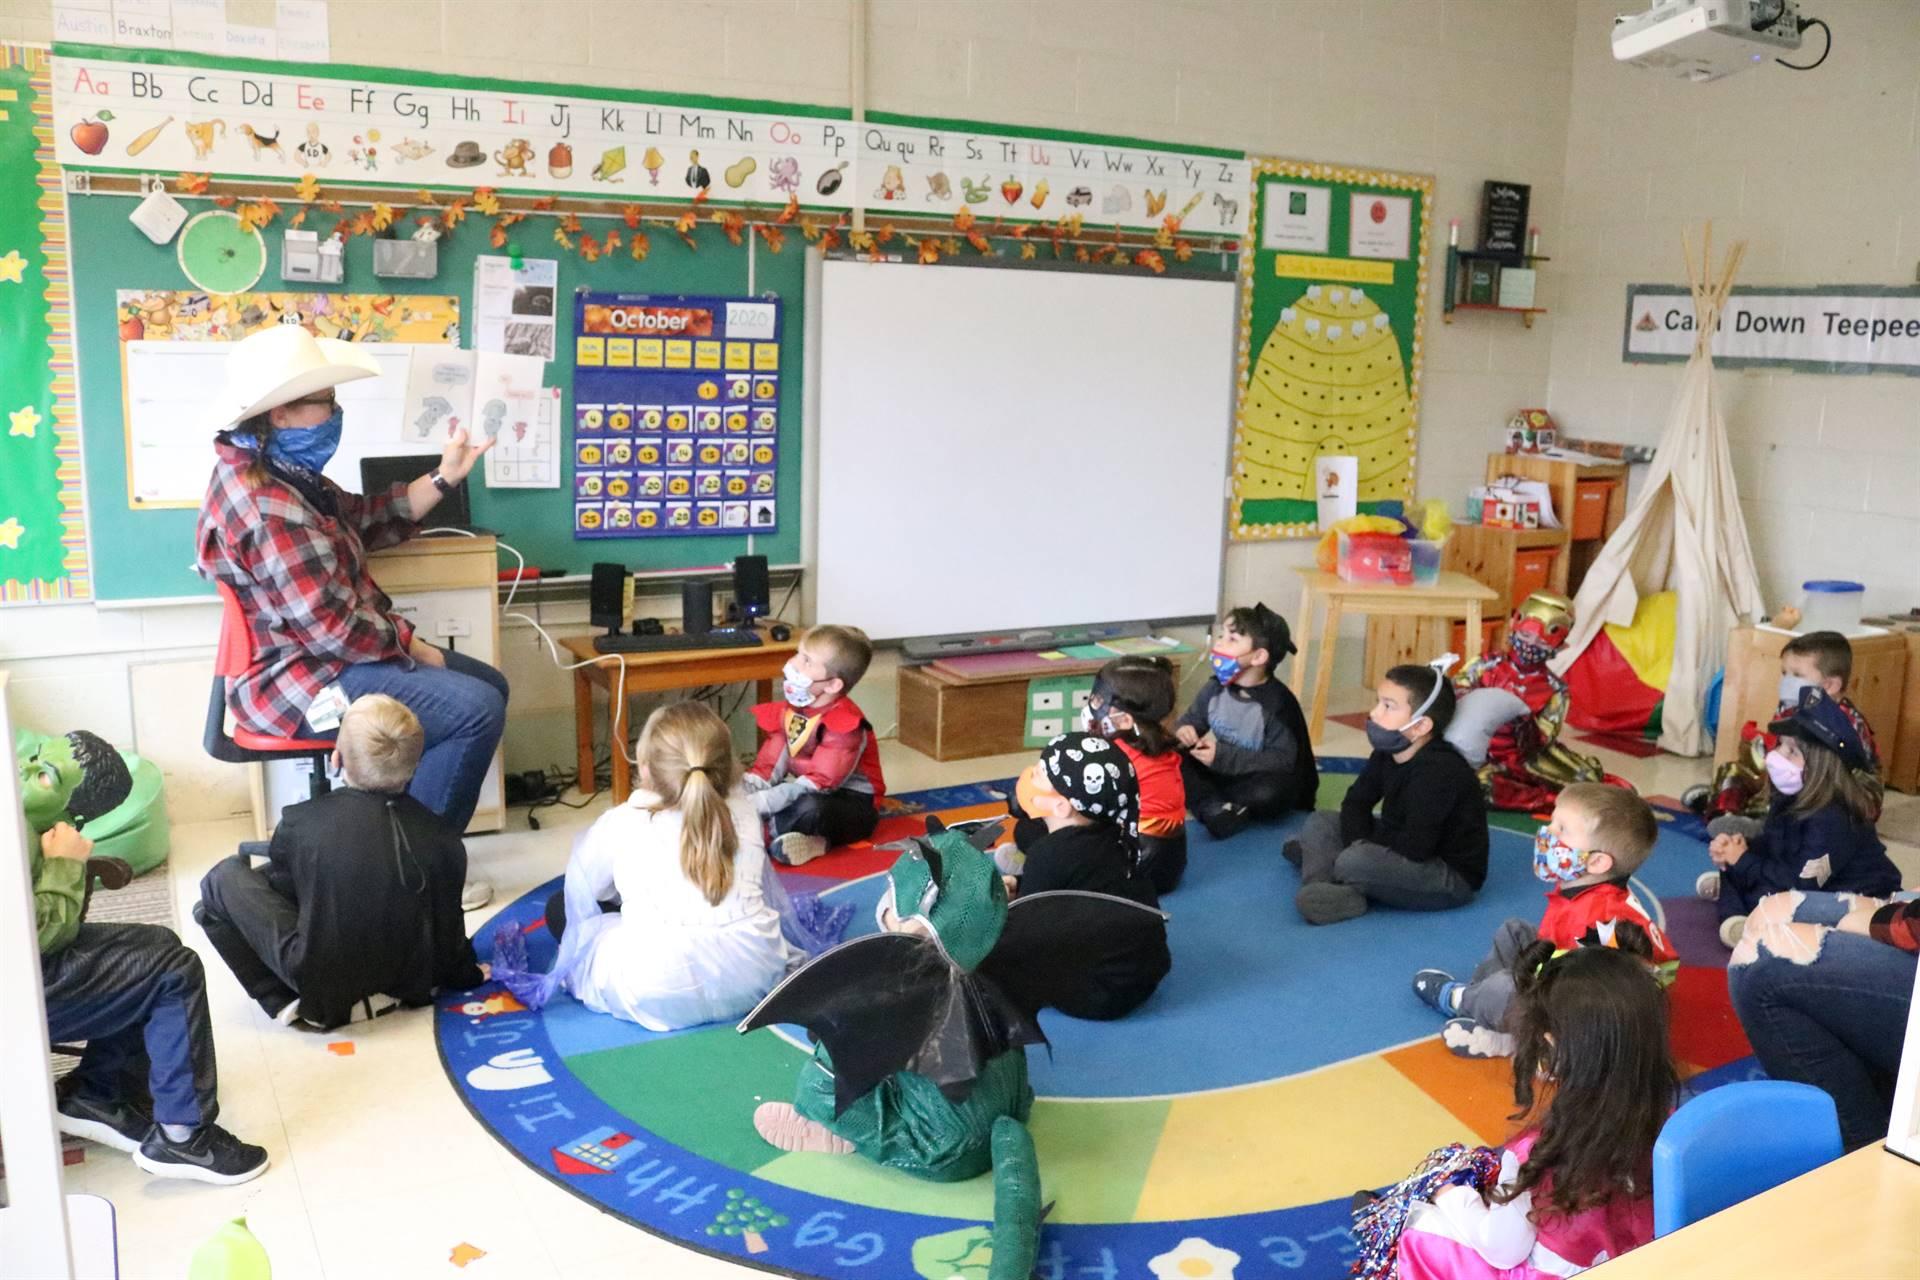 teacher reading a book to kids sitting on floor